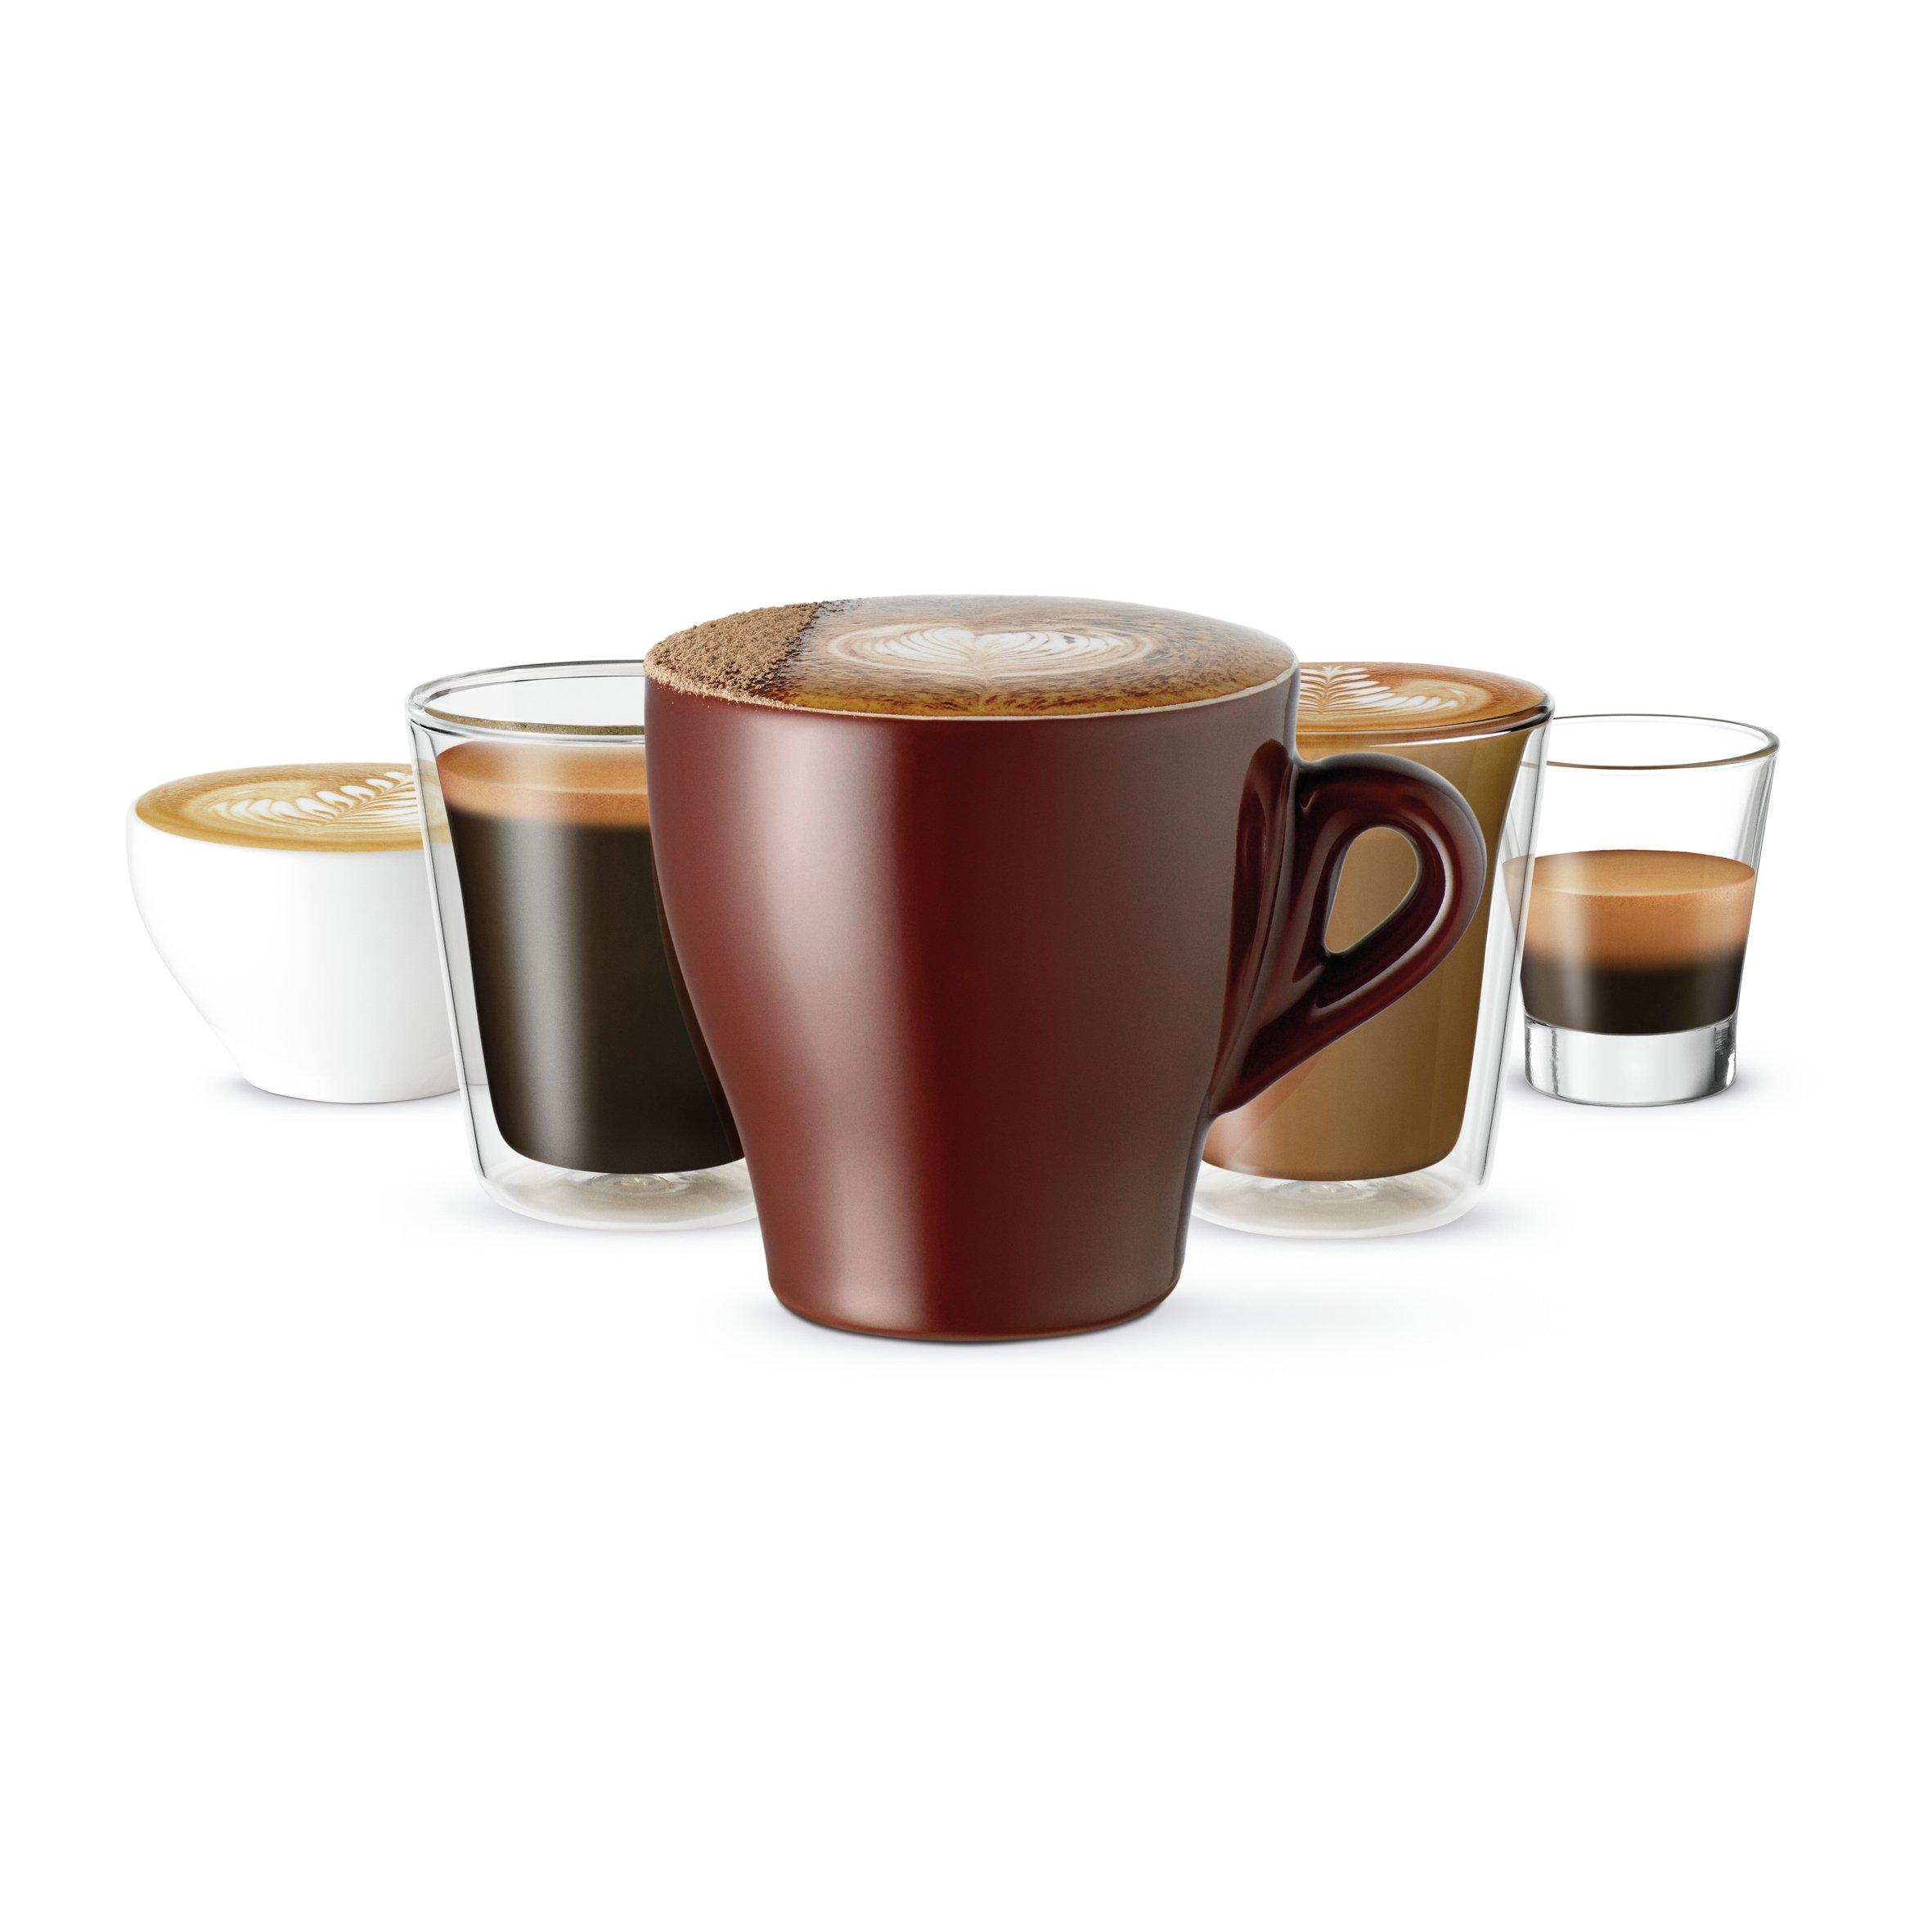 Breville-Nespresso USA BNE800BSSUSC Nespresso Creatista Plus Coffee Espresso Machine, 1, Stainless Steel by Breville